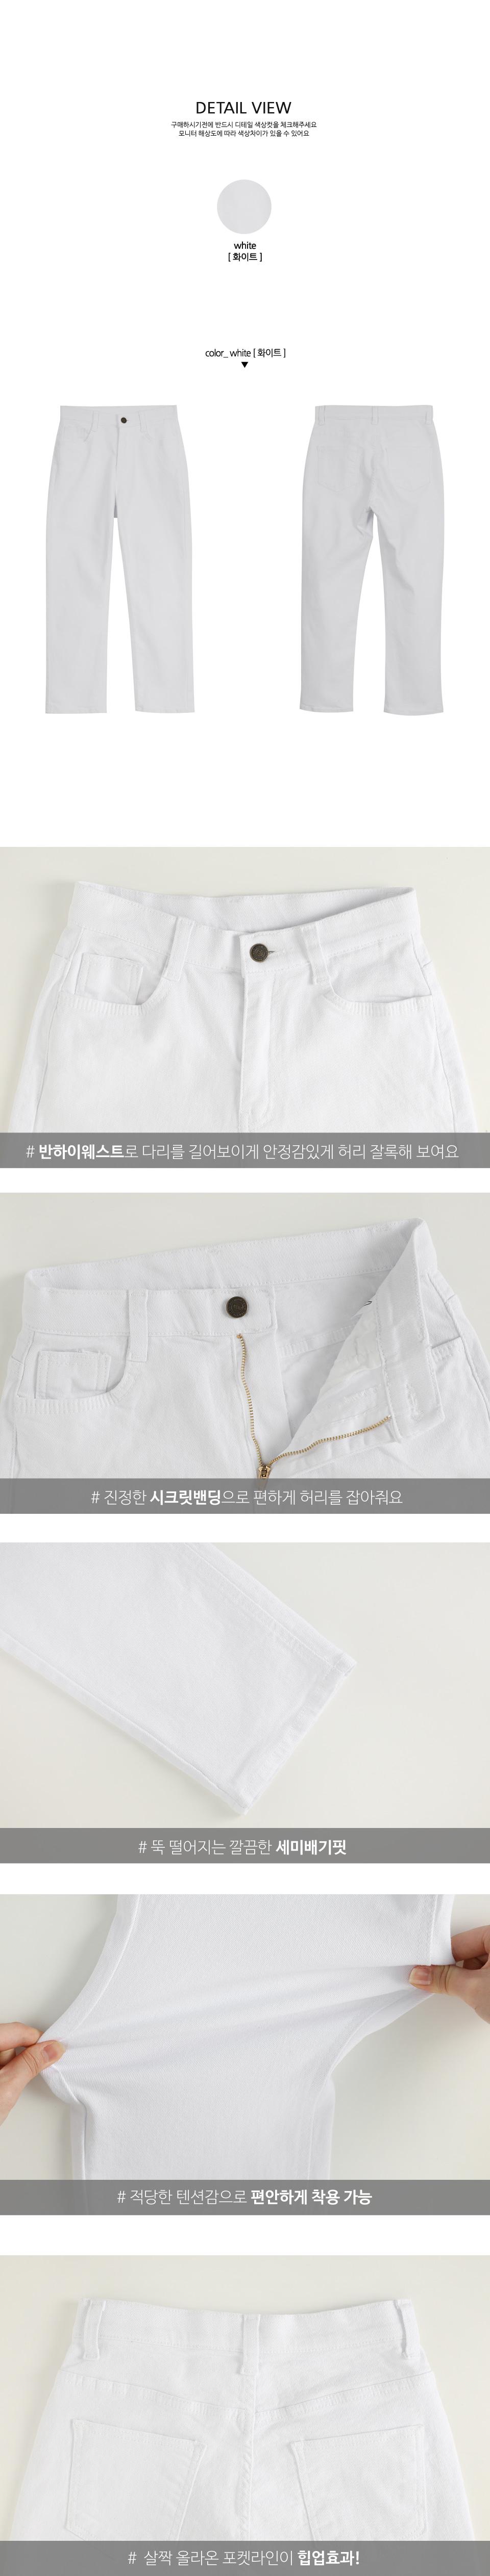 White semi-exhaust pants